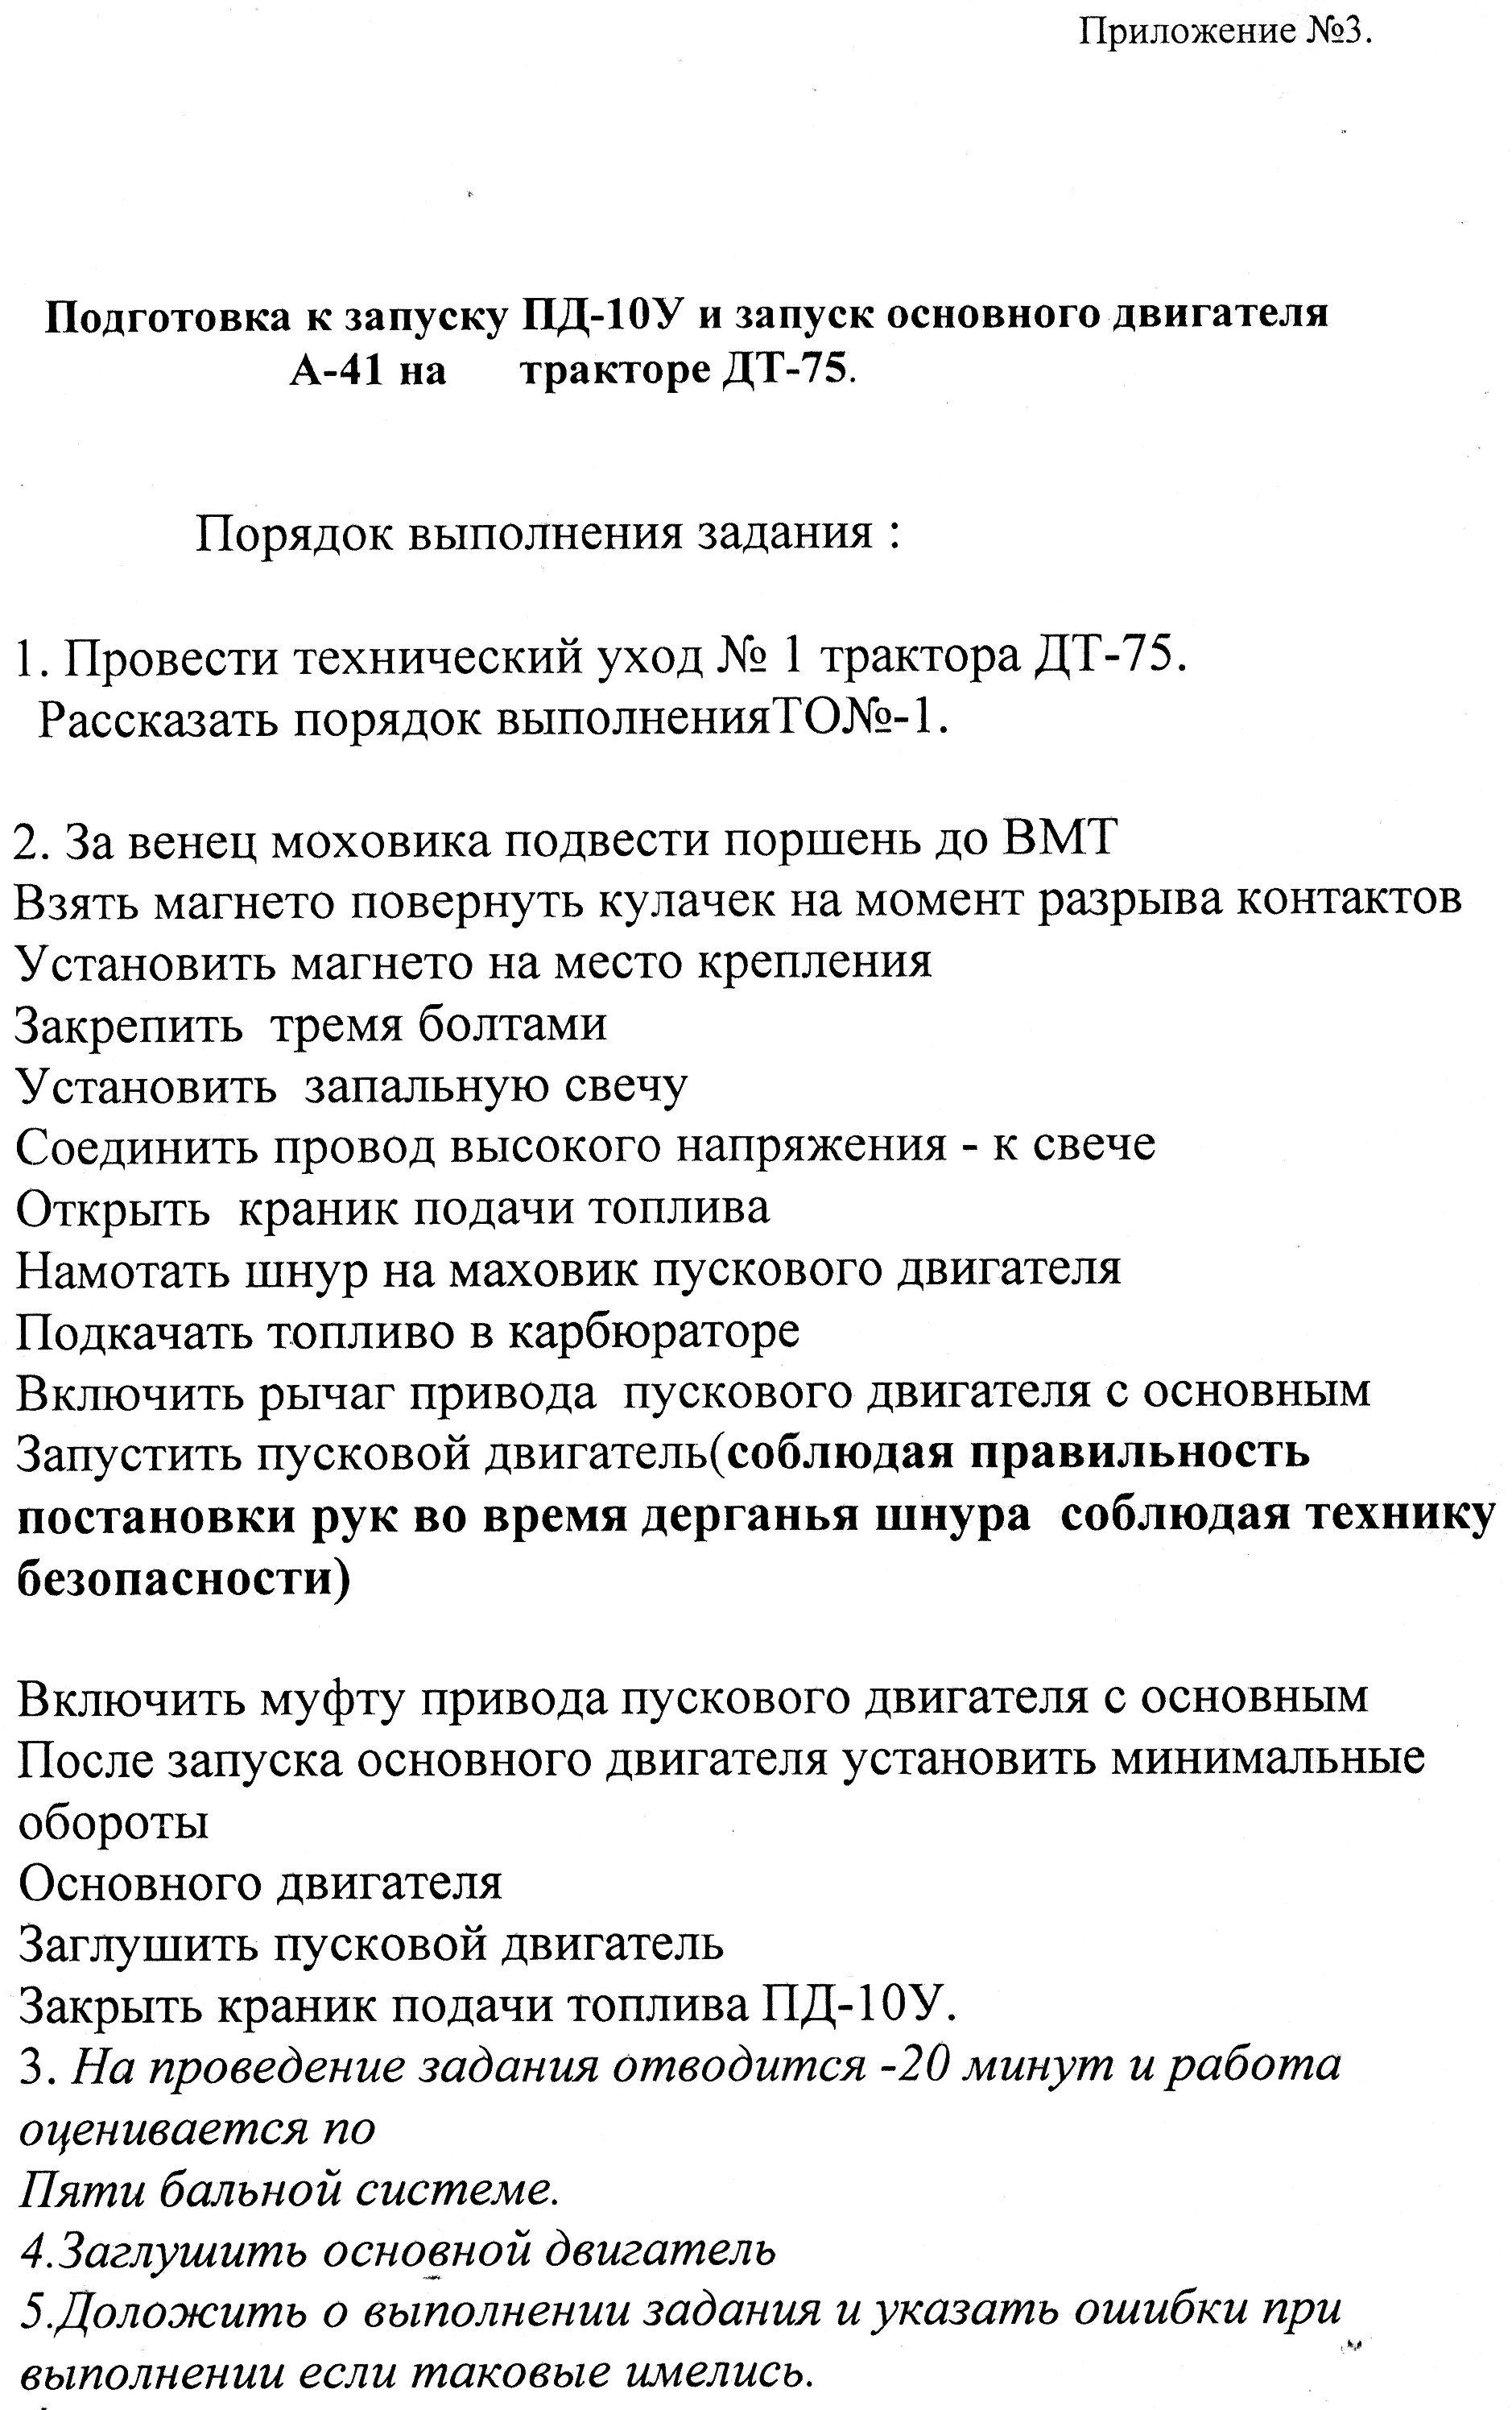 C:\Users\Василий Мельченко\Pictures\img571.jpg